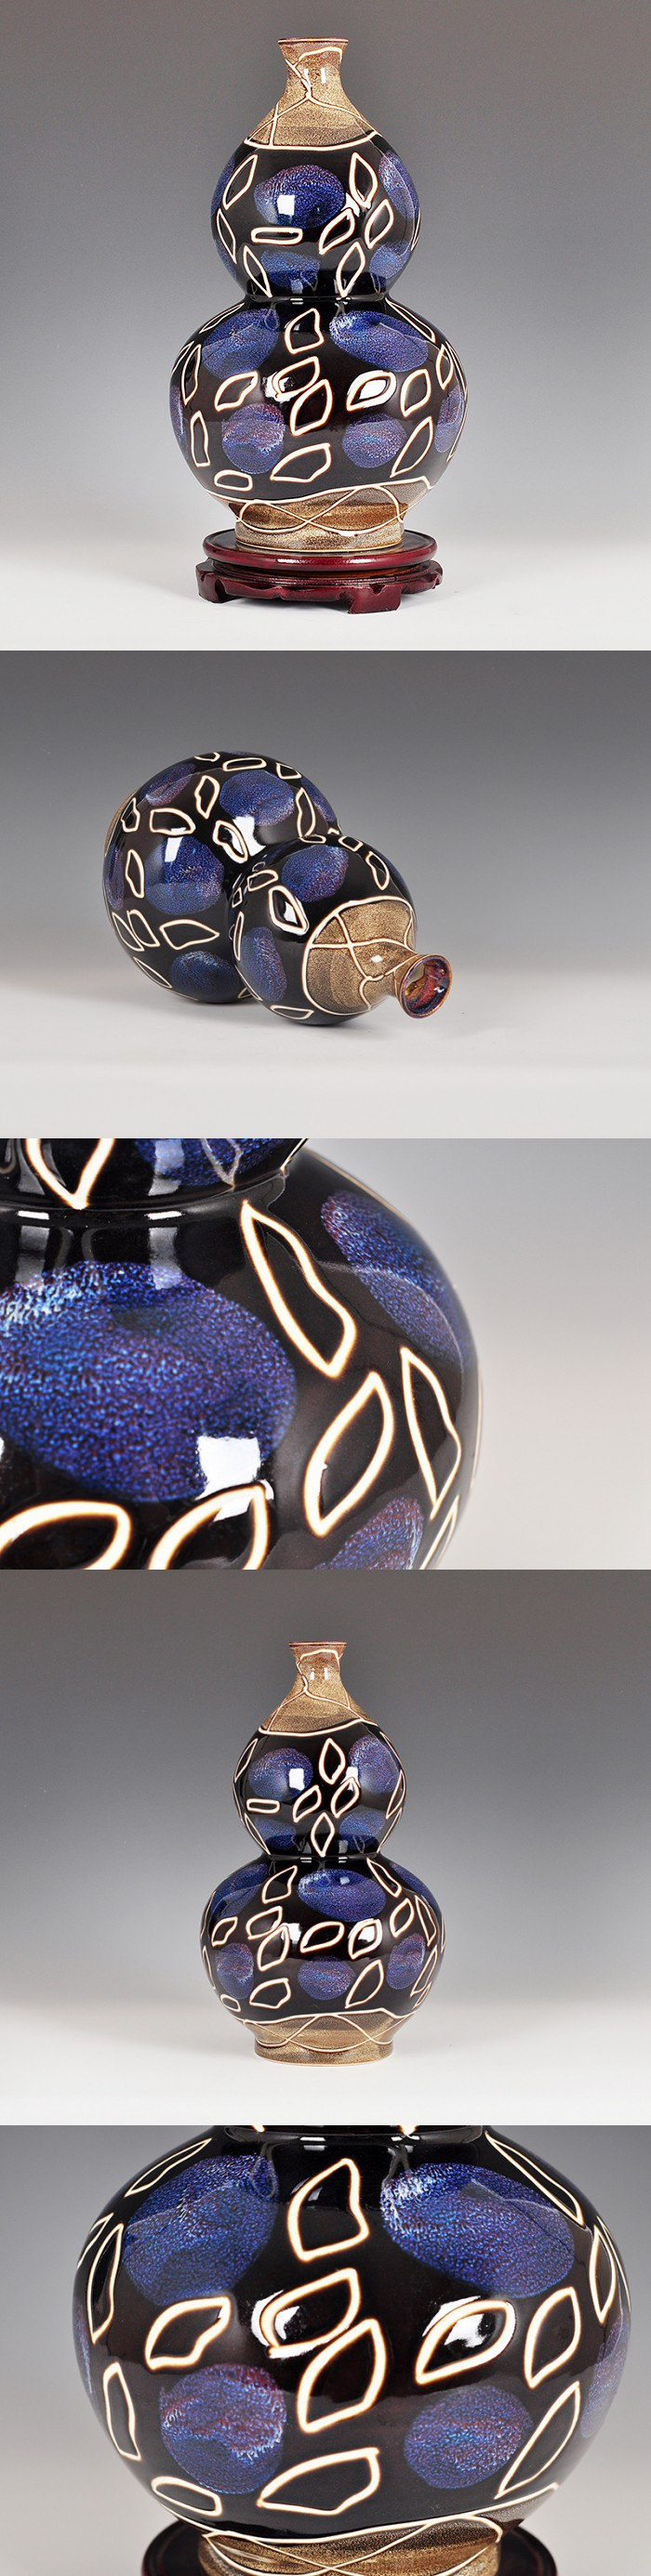 Are lucky gourd vase living room modern minimalist flower floral decor decoration Home Furnishing stem $84.52